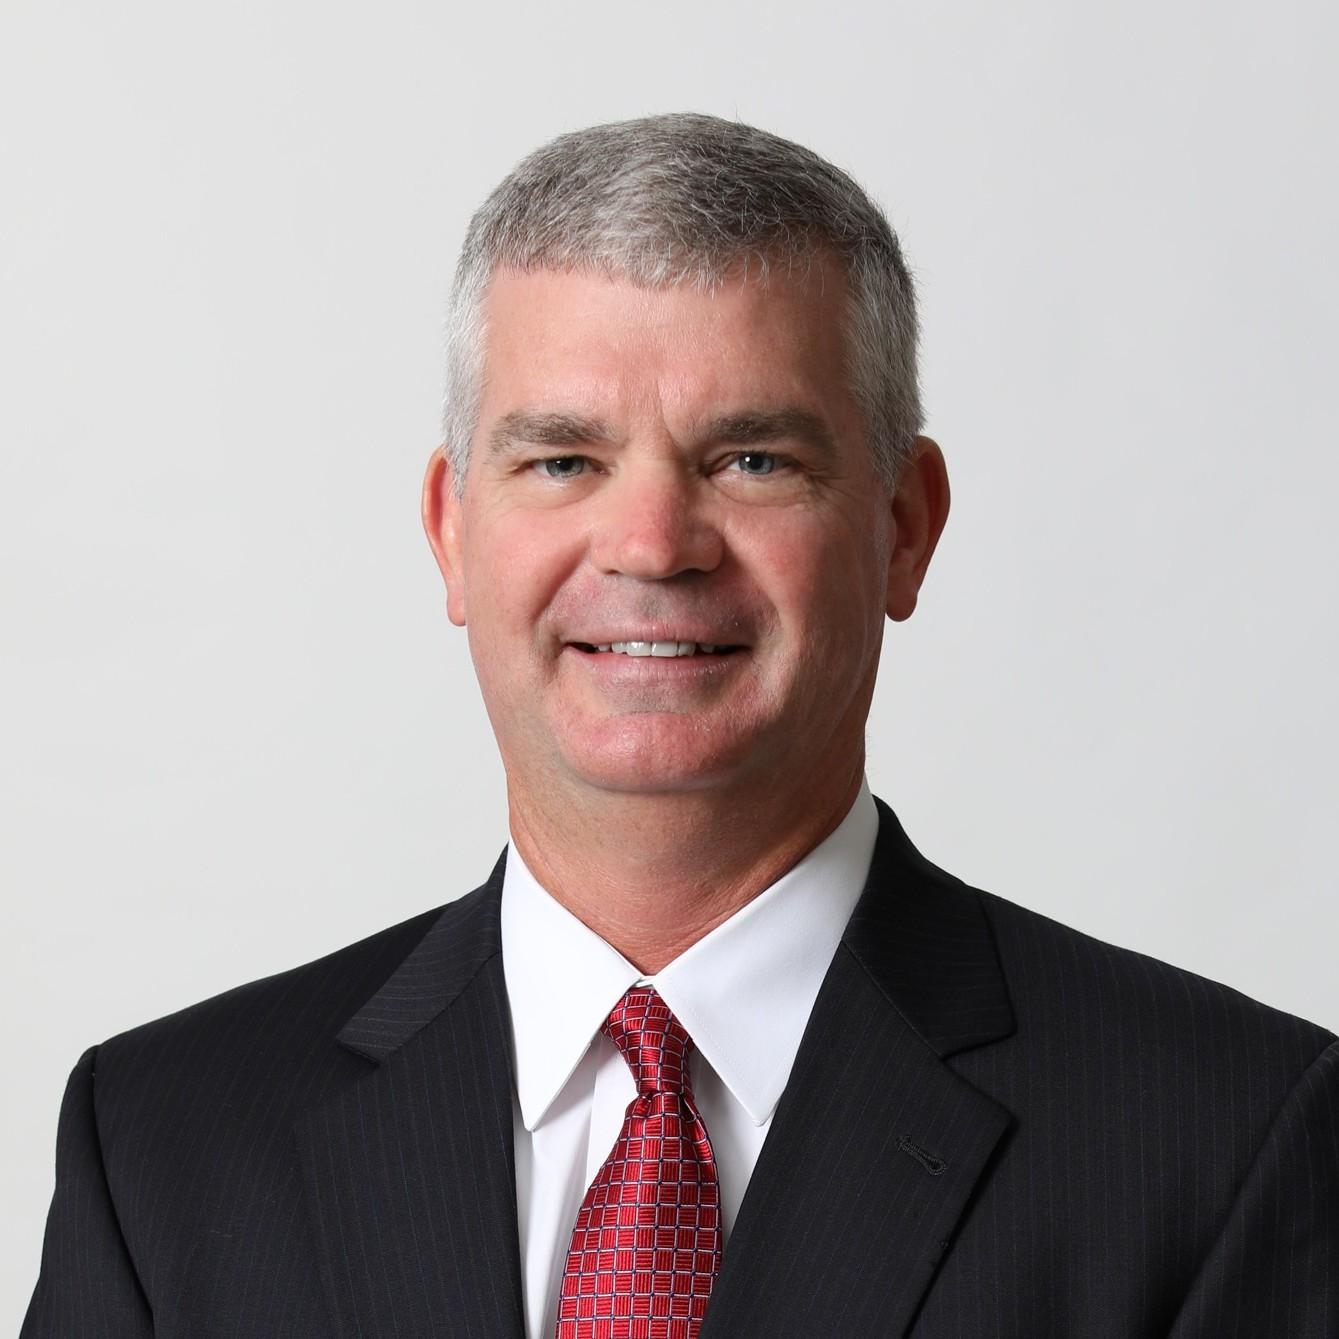 Curt Mackey